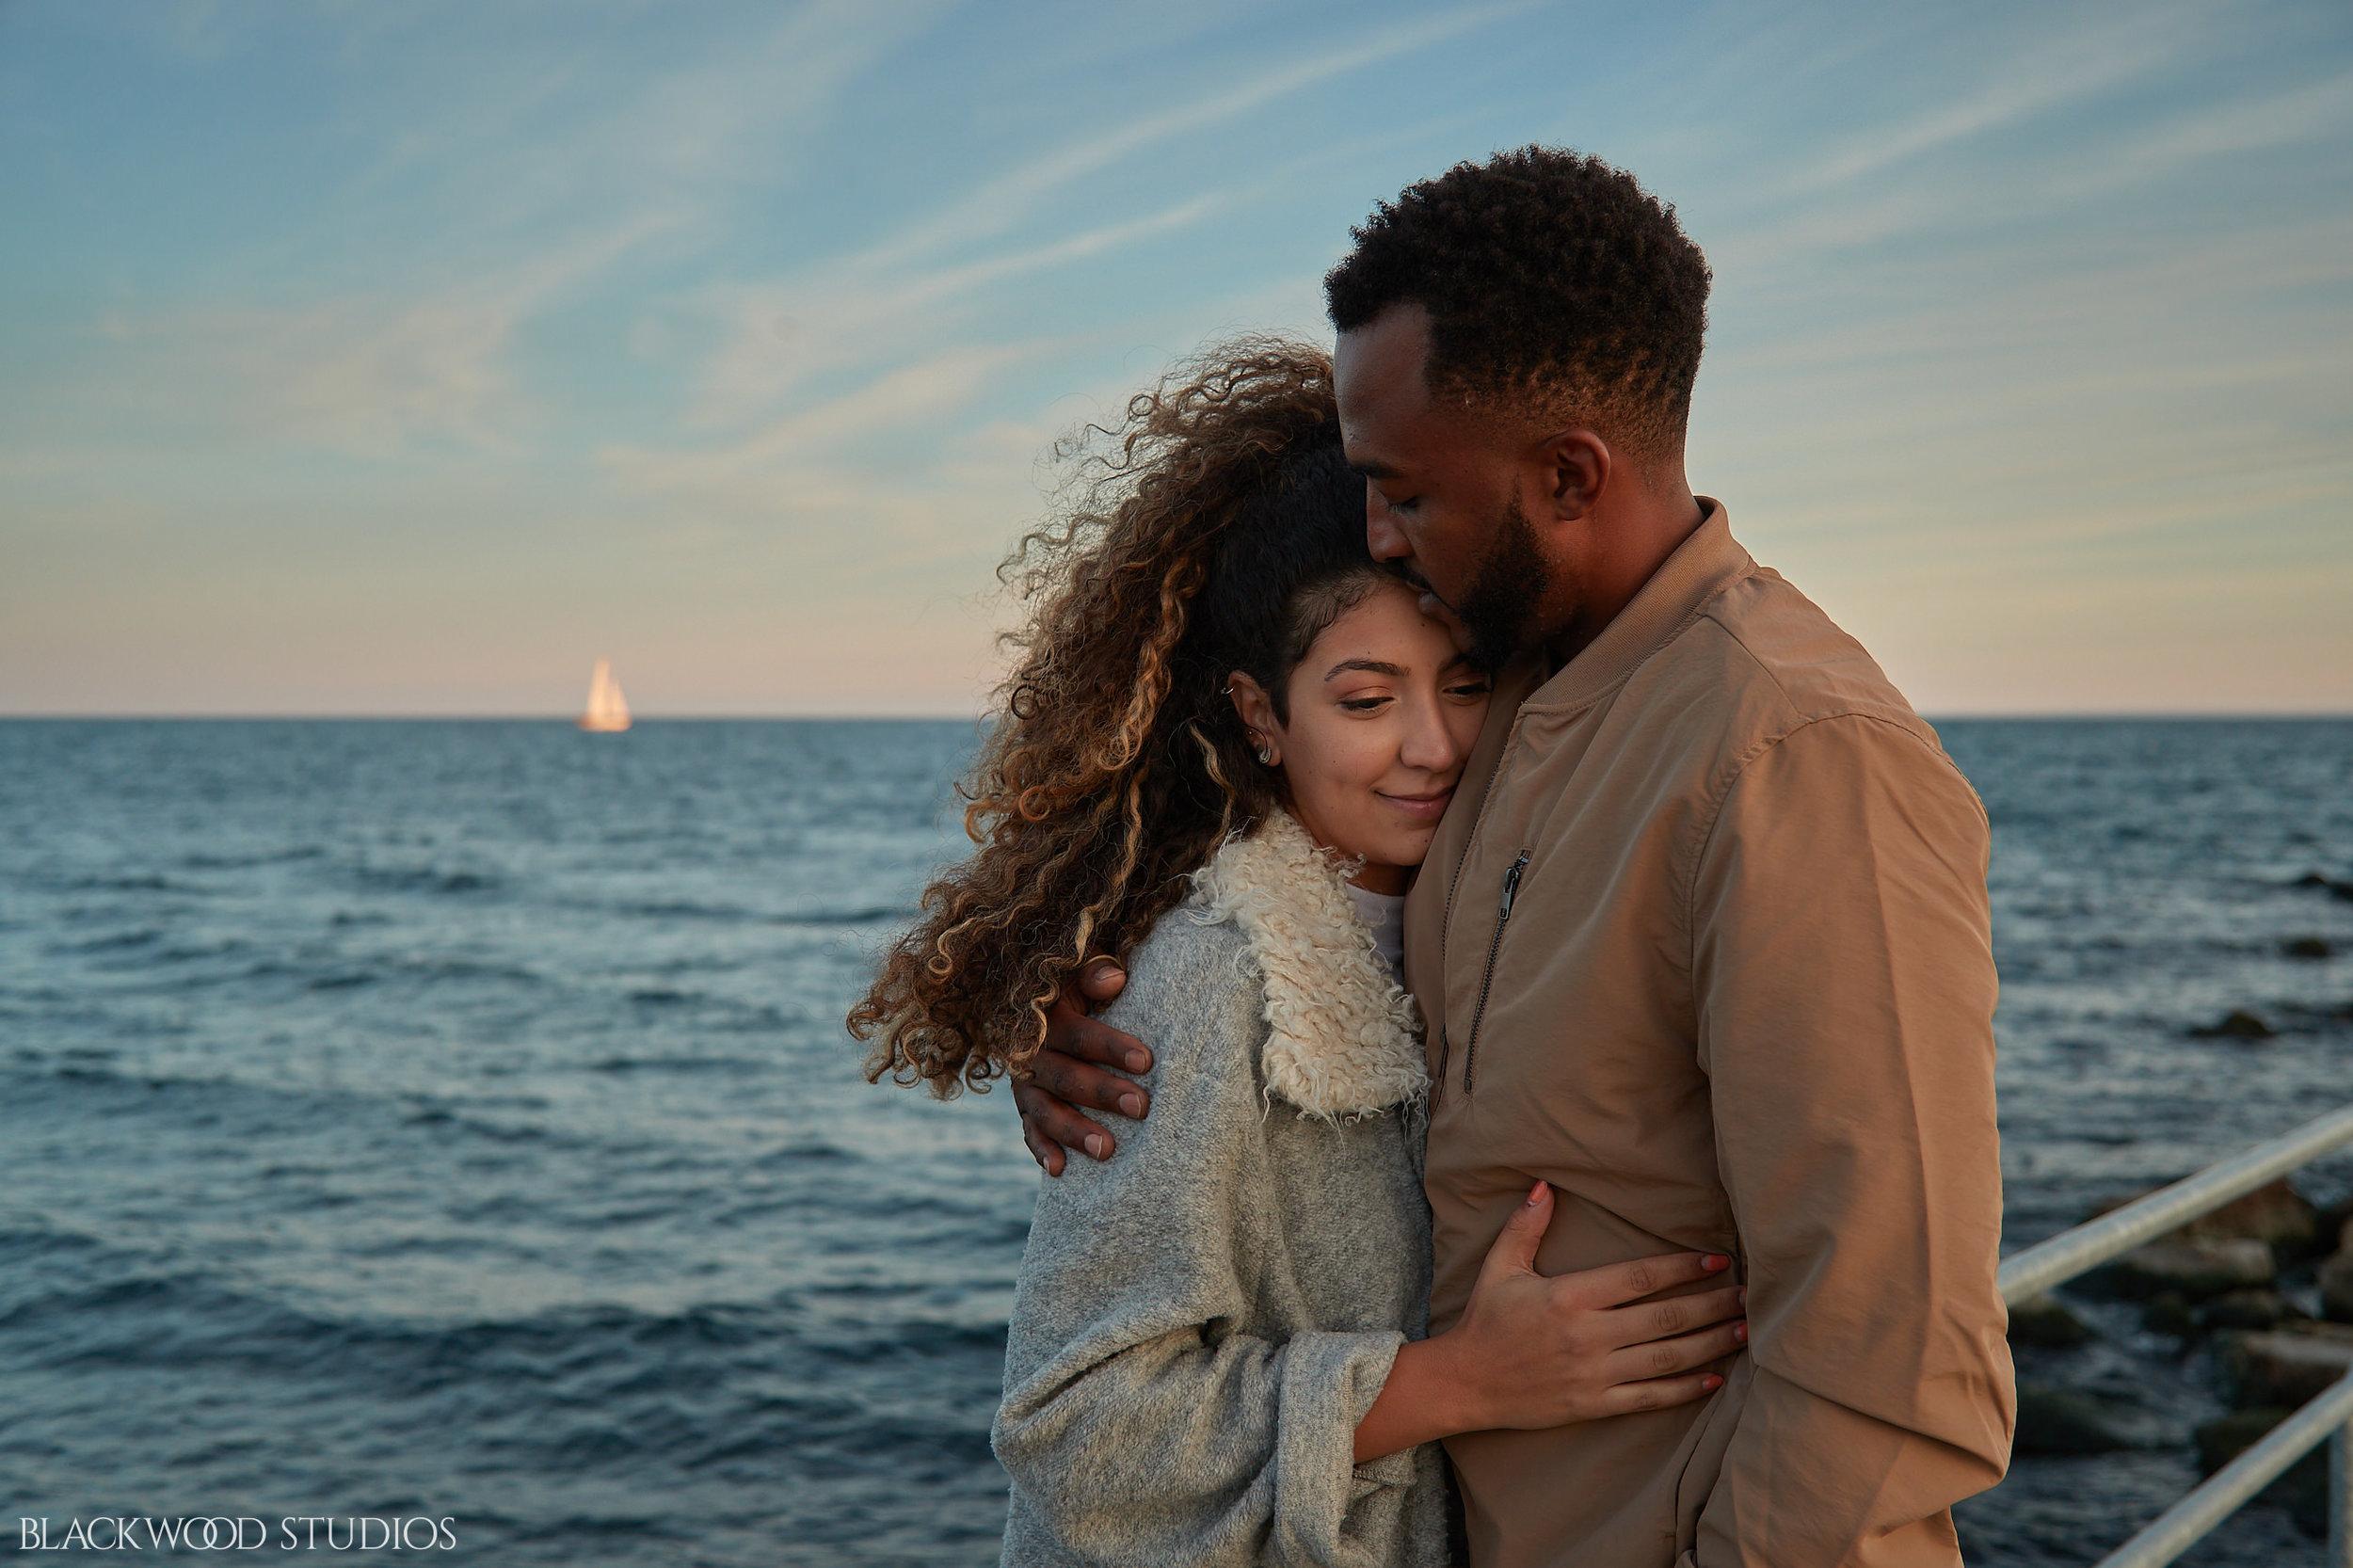 Blackwood-Studios-20181014-182944-Nader-and-Rayane-Engagement-photography-Lakeside-Park-Oakville-Ontario-Canada.jpg